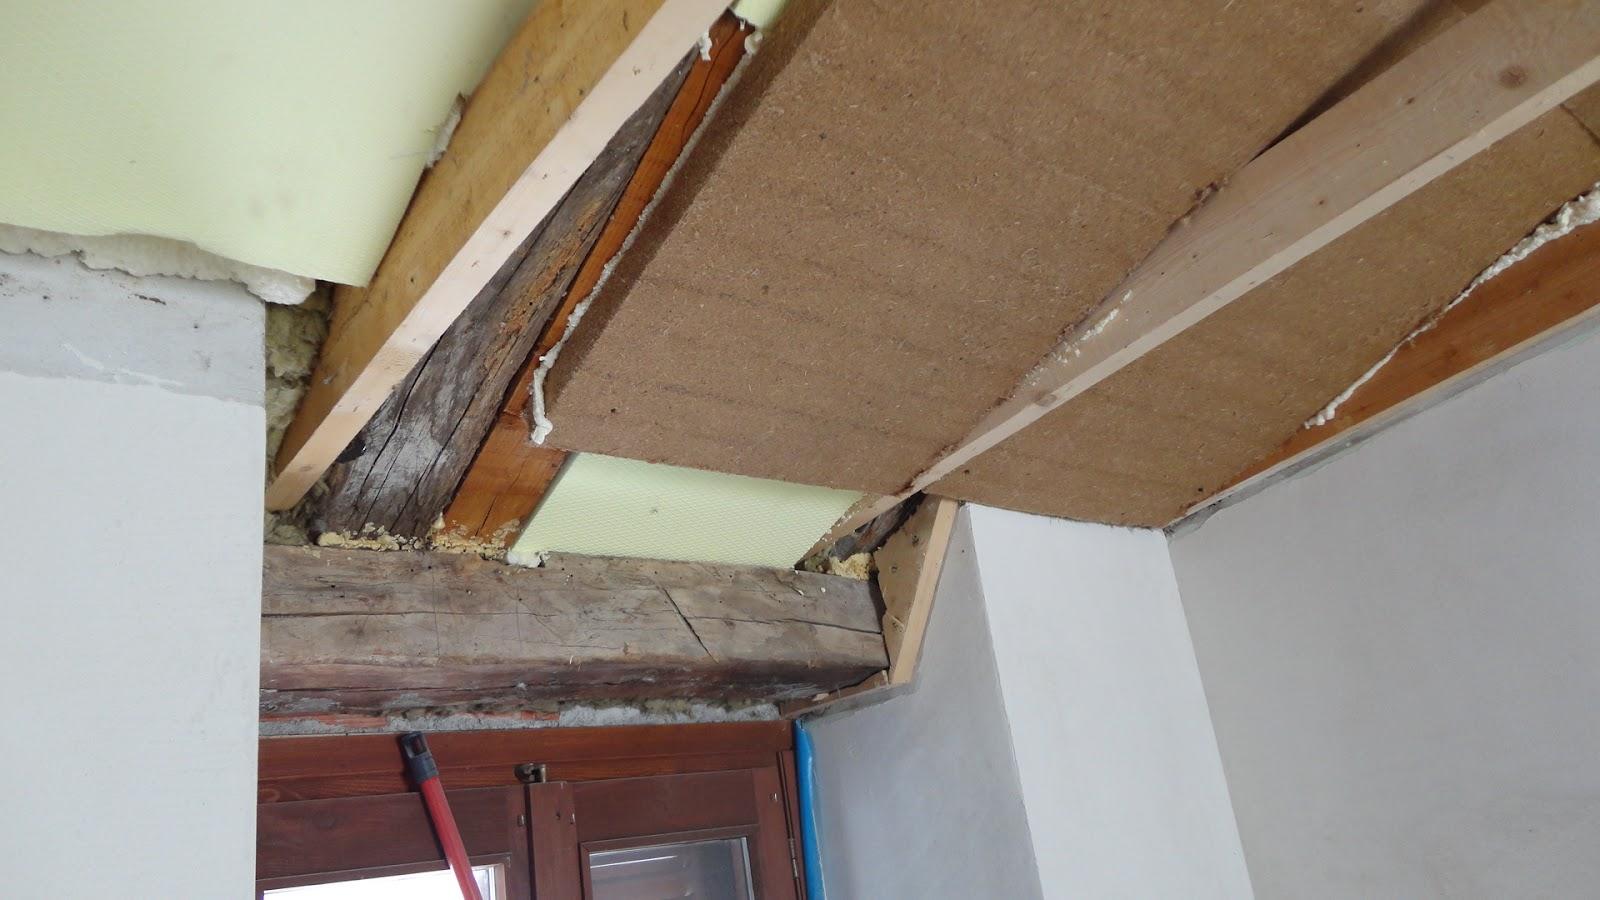 Falegnameria sansi tetto mansarda isolamento e rivestimento - Isolamento tetto interno ...